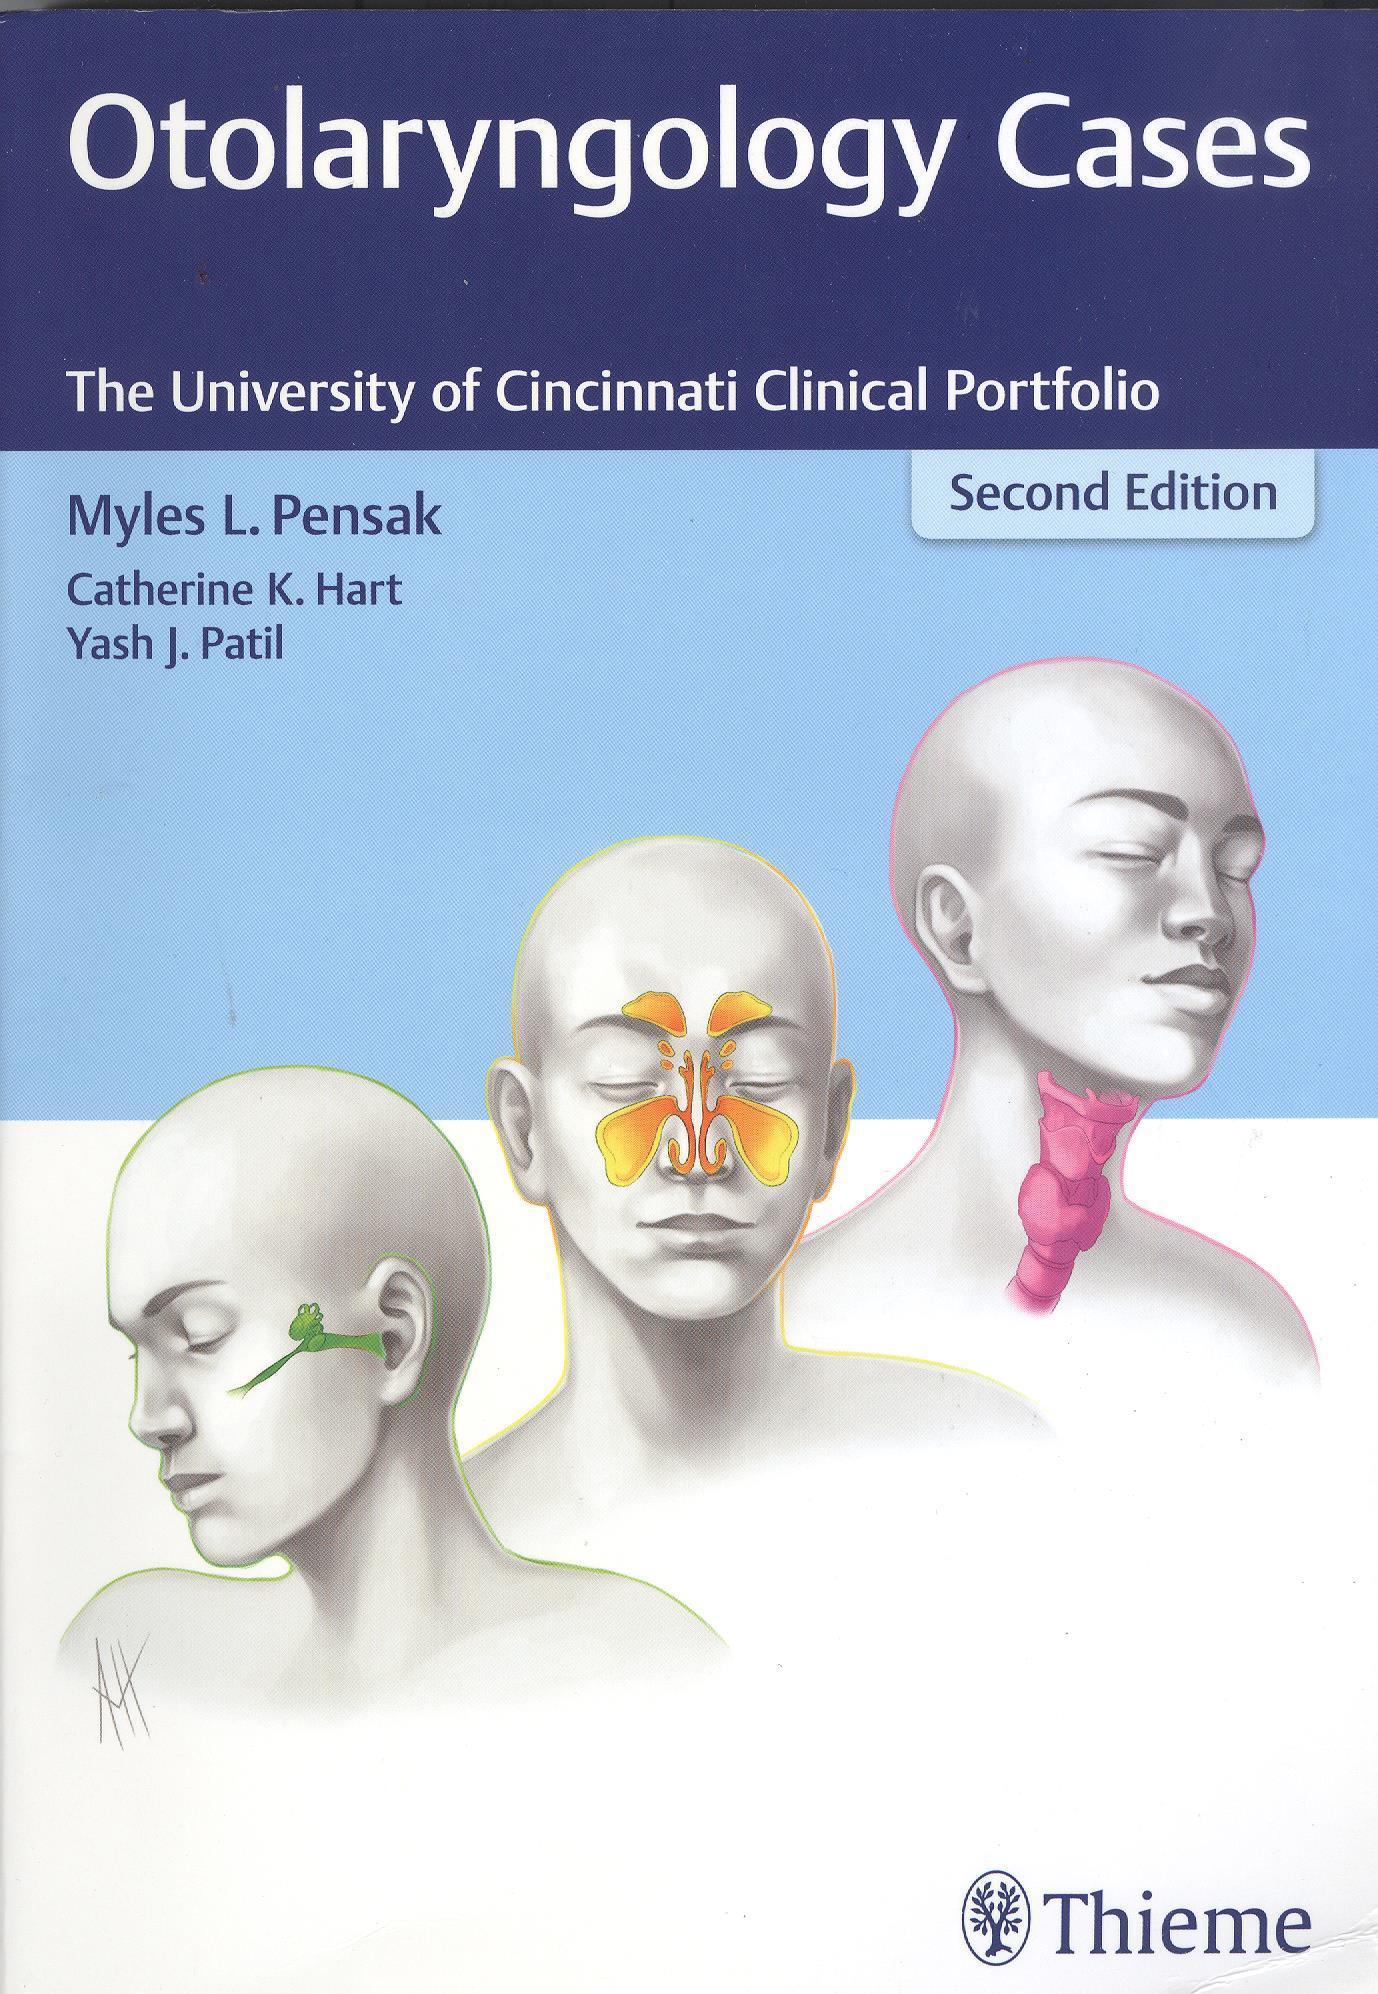 Otolaryngology Cases: The University of Cincinnati Clinical Portfolio, 2nd edition